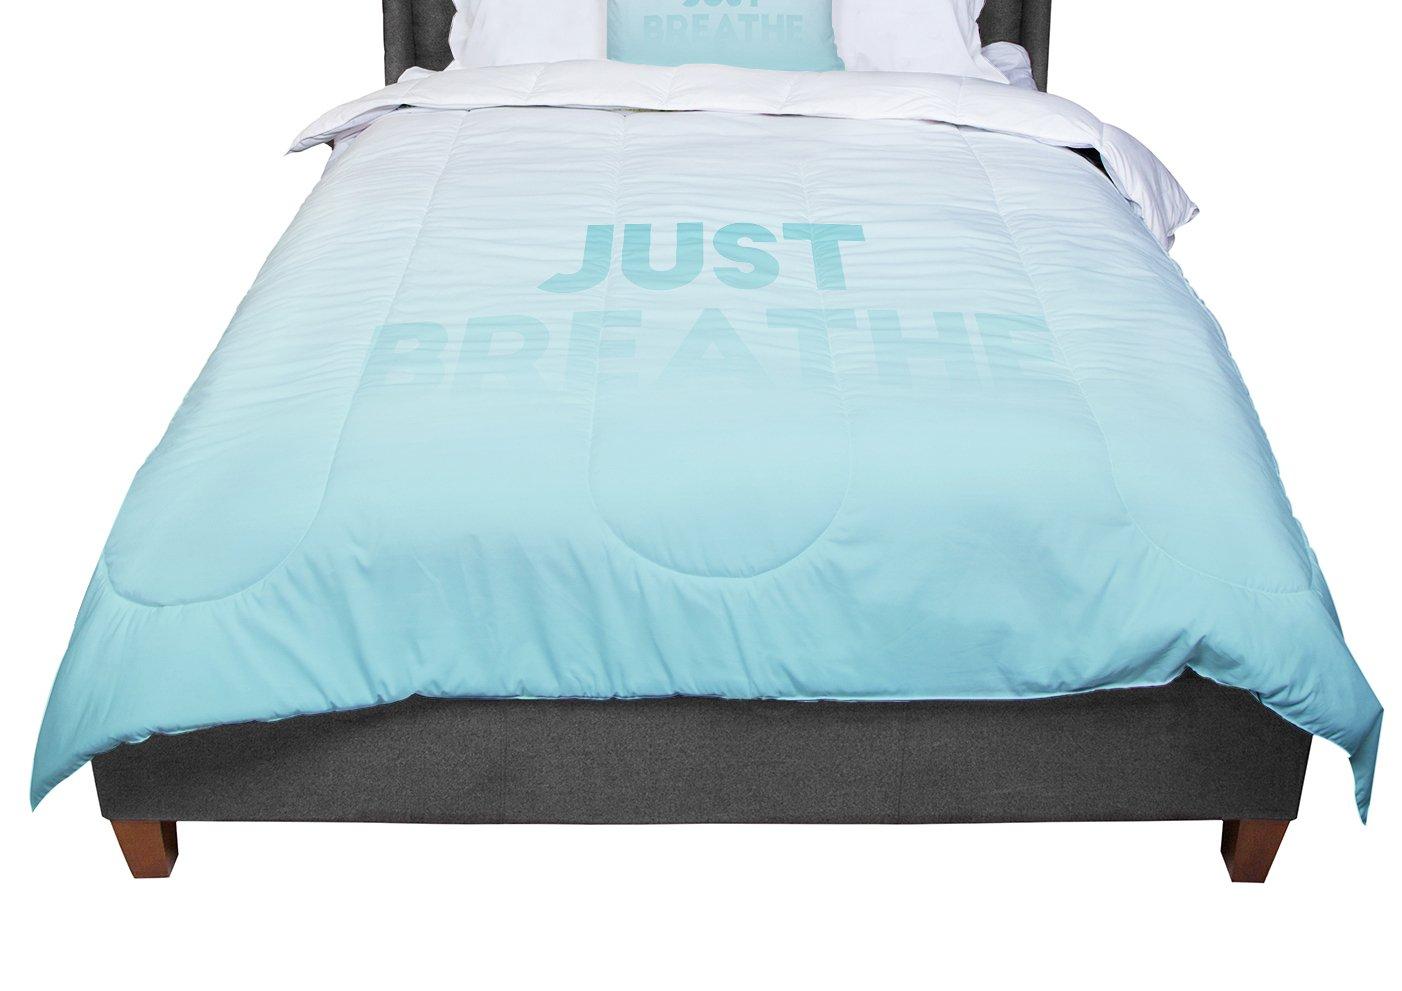 68 X 88 KESS InHouse KESS Original Just Breathe Blue Teal Twin Comforter